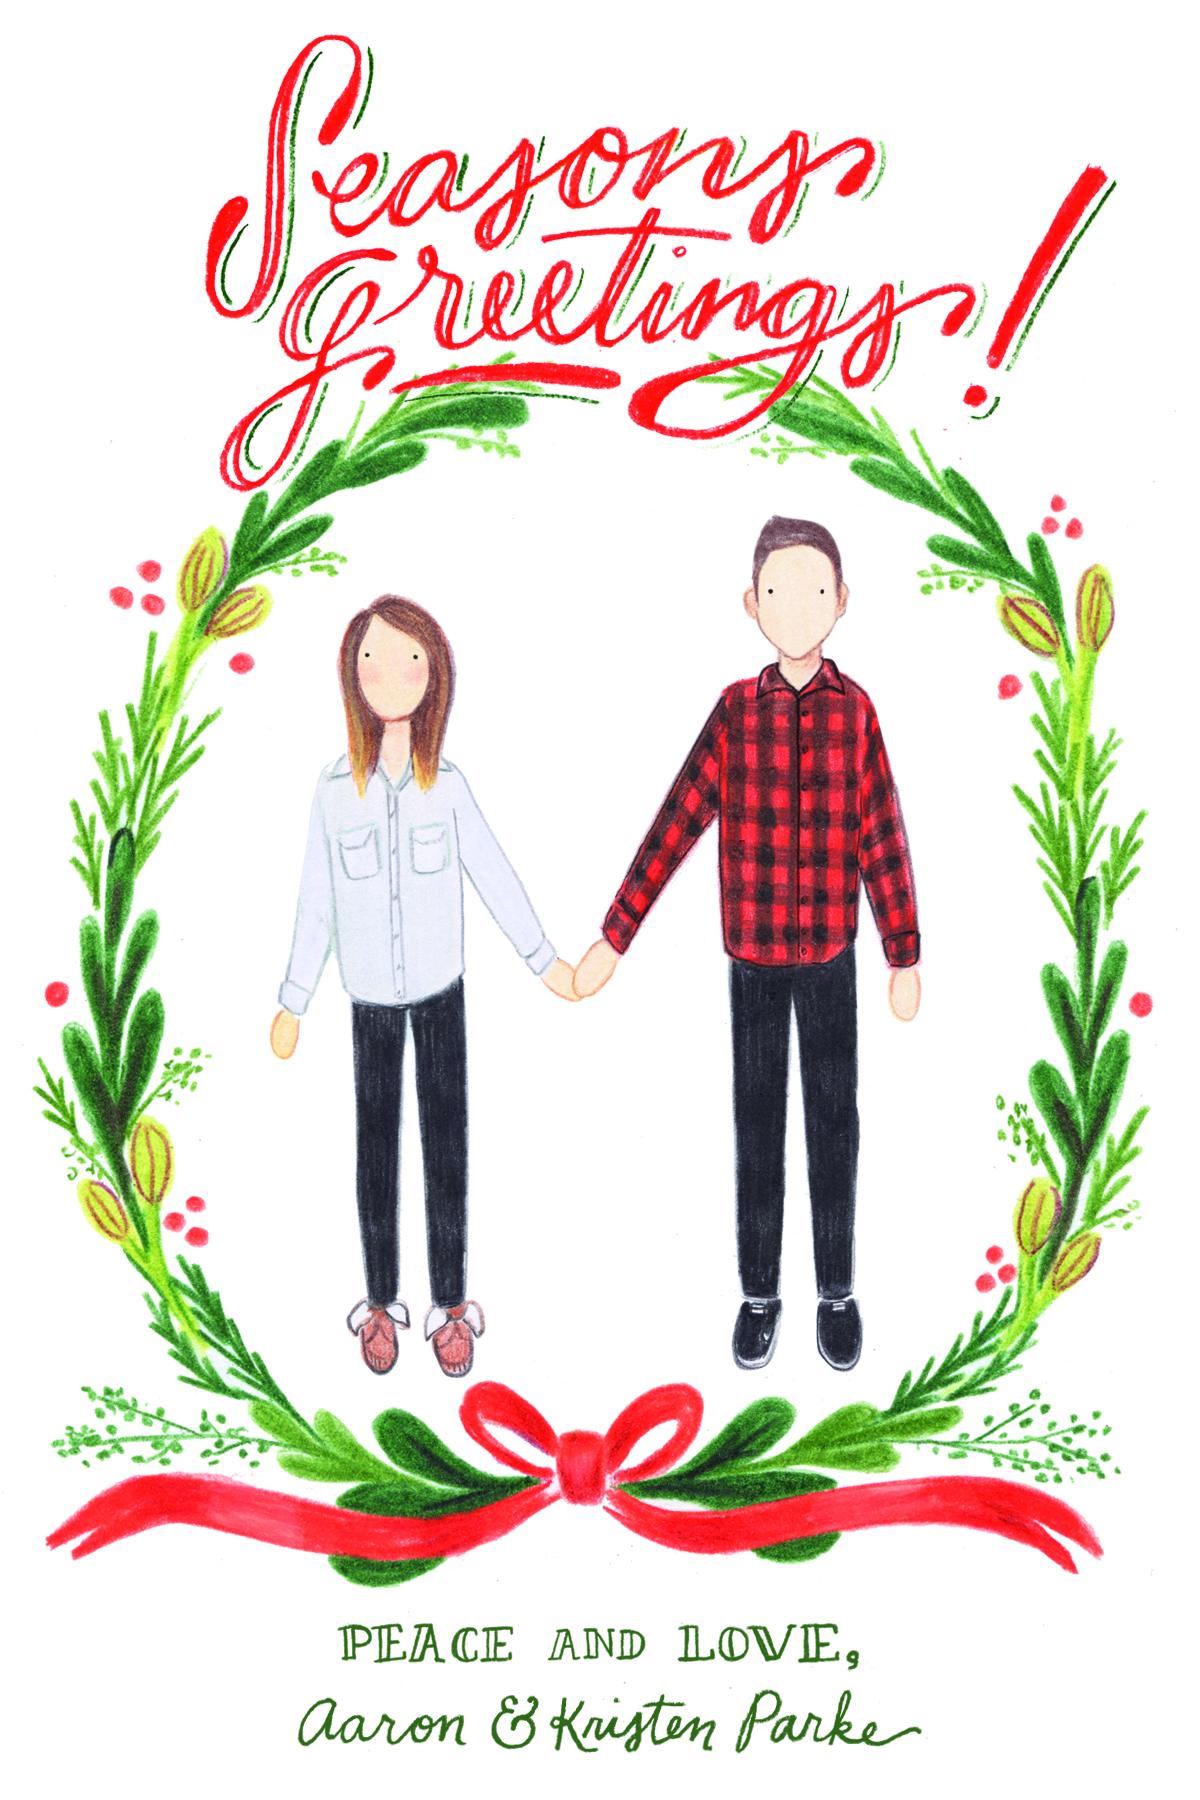 Parke Christmas Card Illustration_v2.jpg